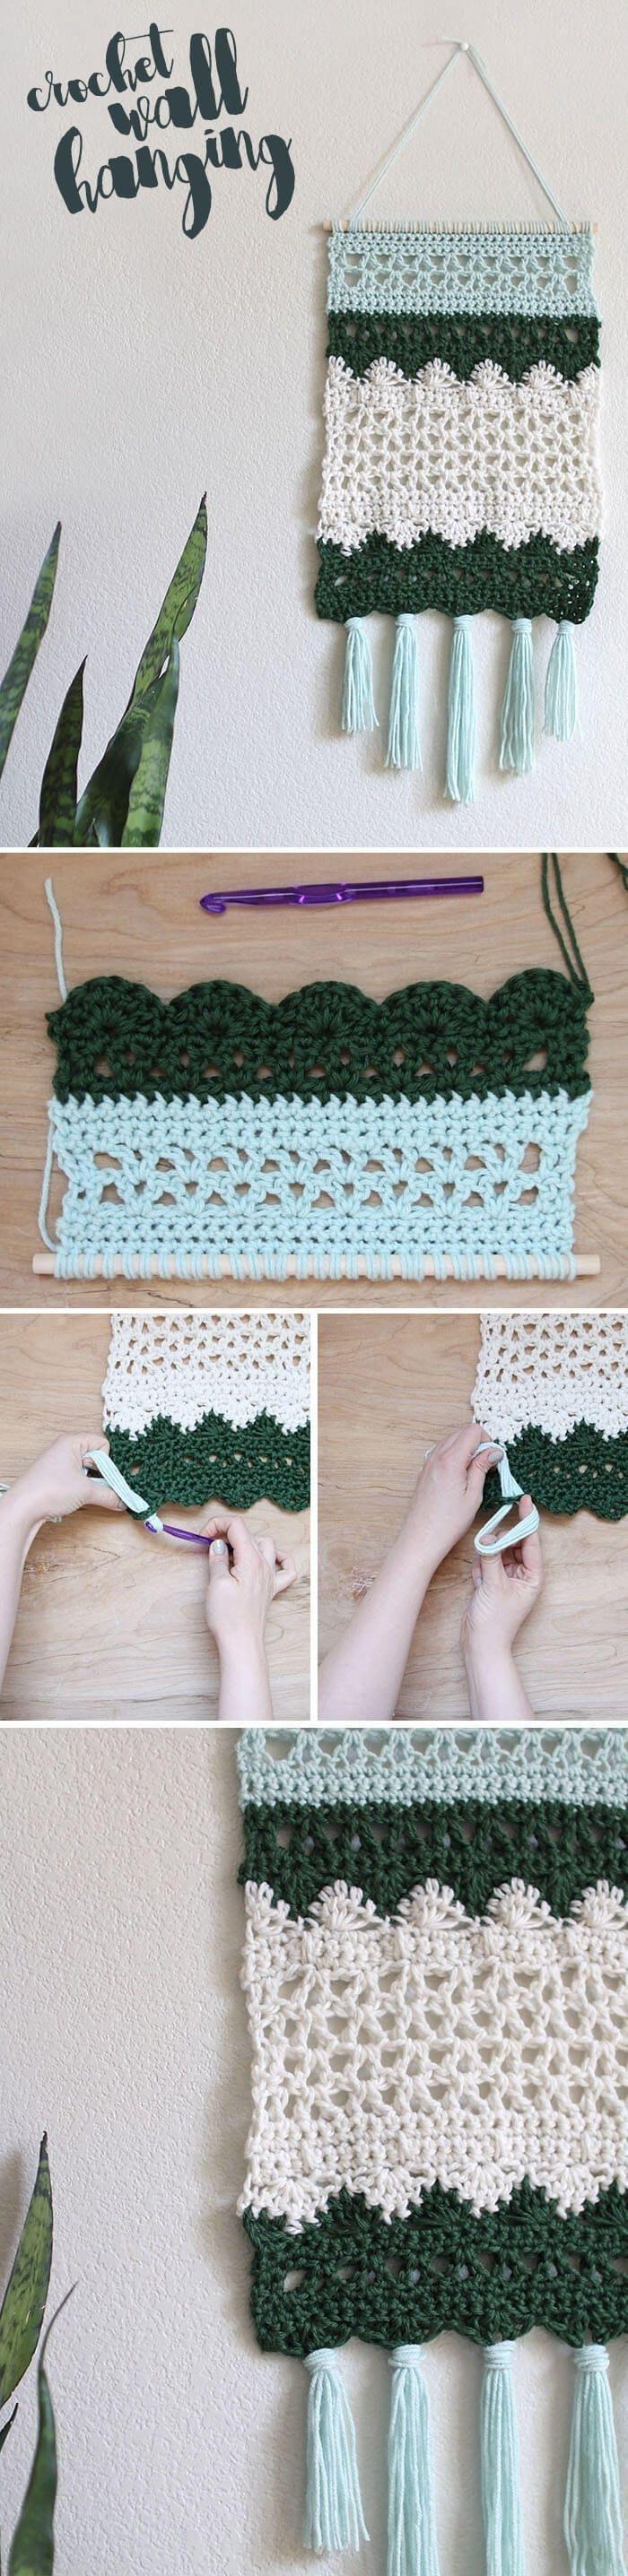 Crochet Wall Hanging Pattern | Crochet Wall Hangings, Wall Hangings Pertaining To Latest Crochet Wall Art (View 7 of 20)